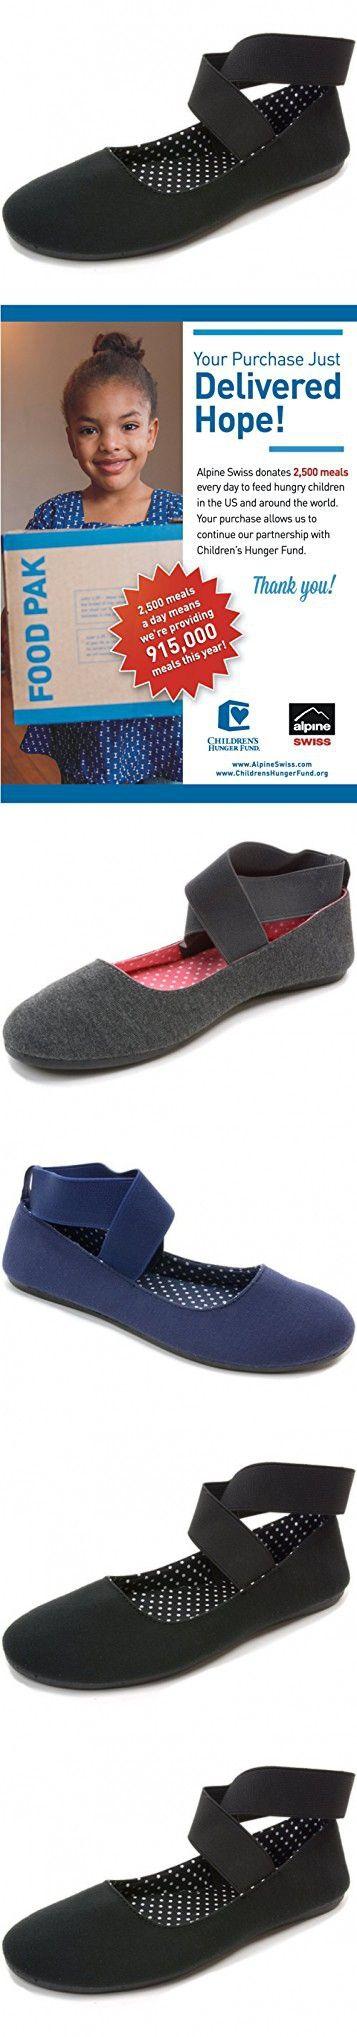 Alpine Swiss Peony Womens Ballet Flats Elastic Ankle Strap Shoes Black 11 M US